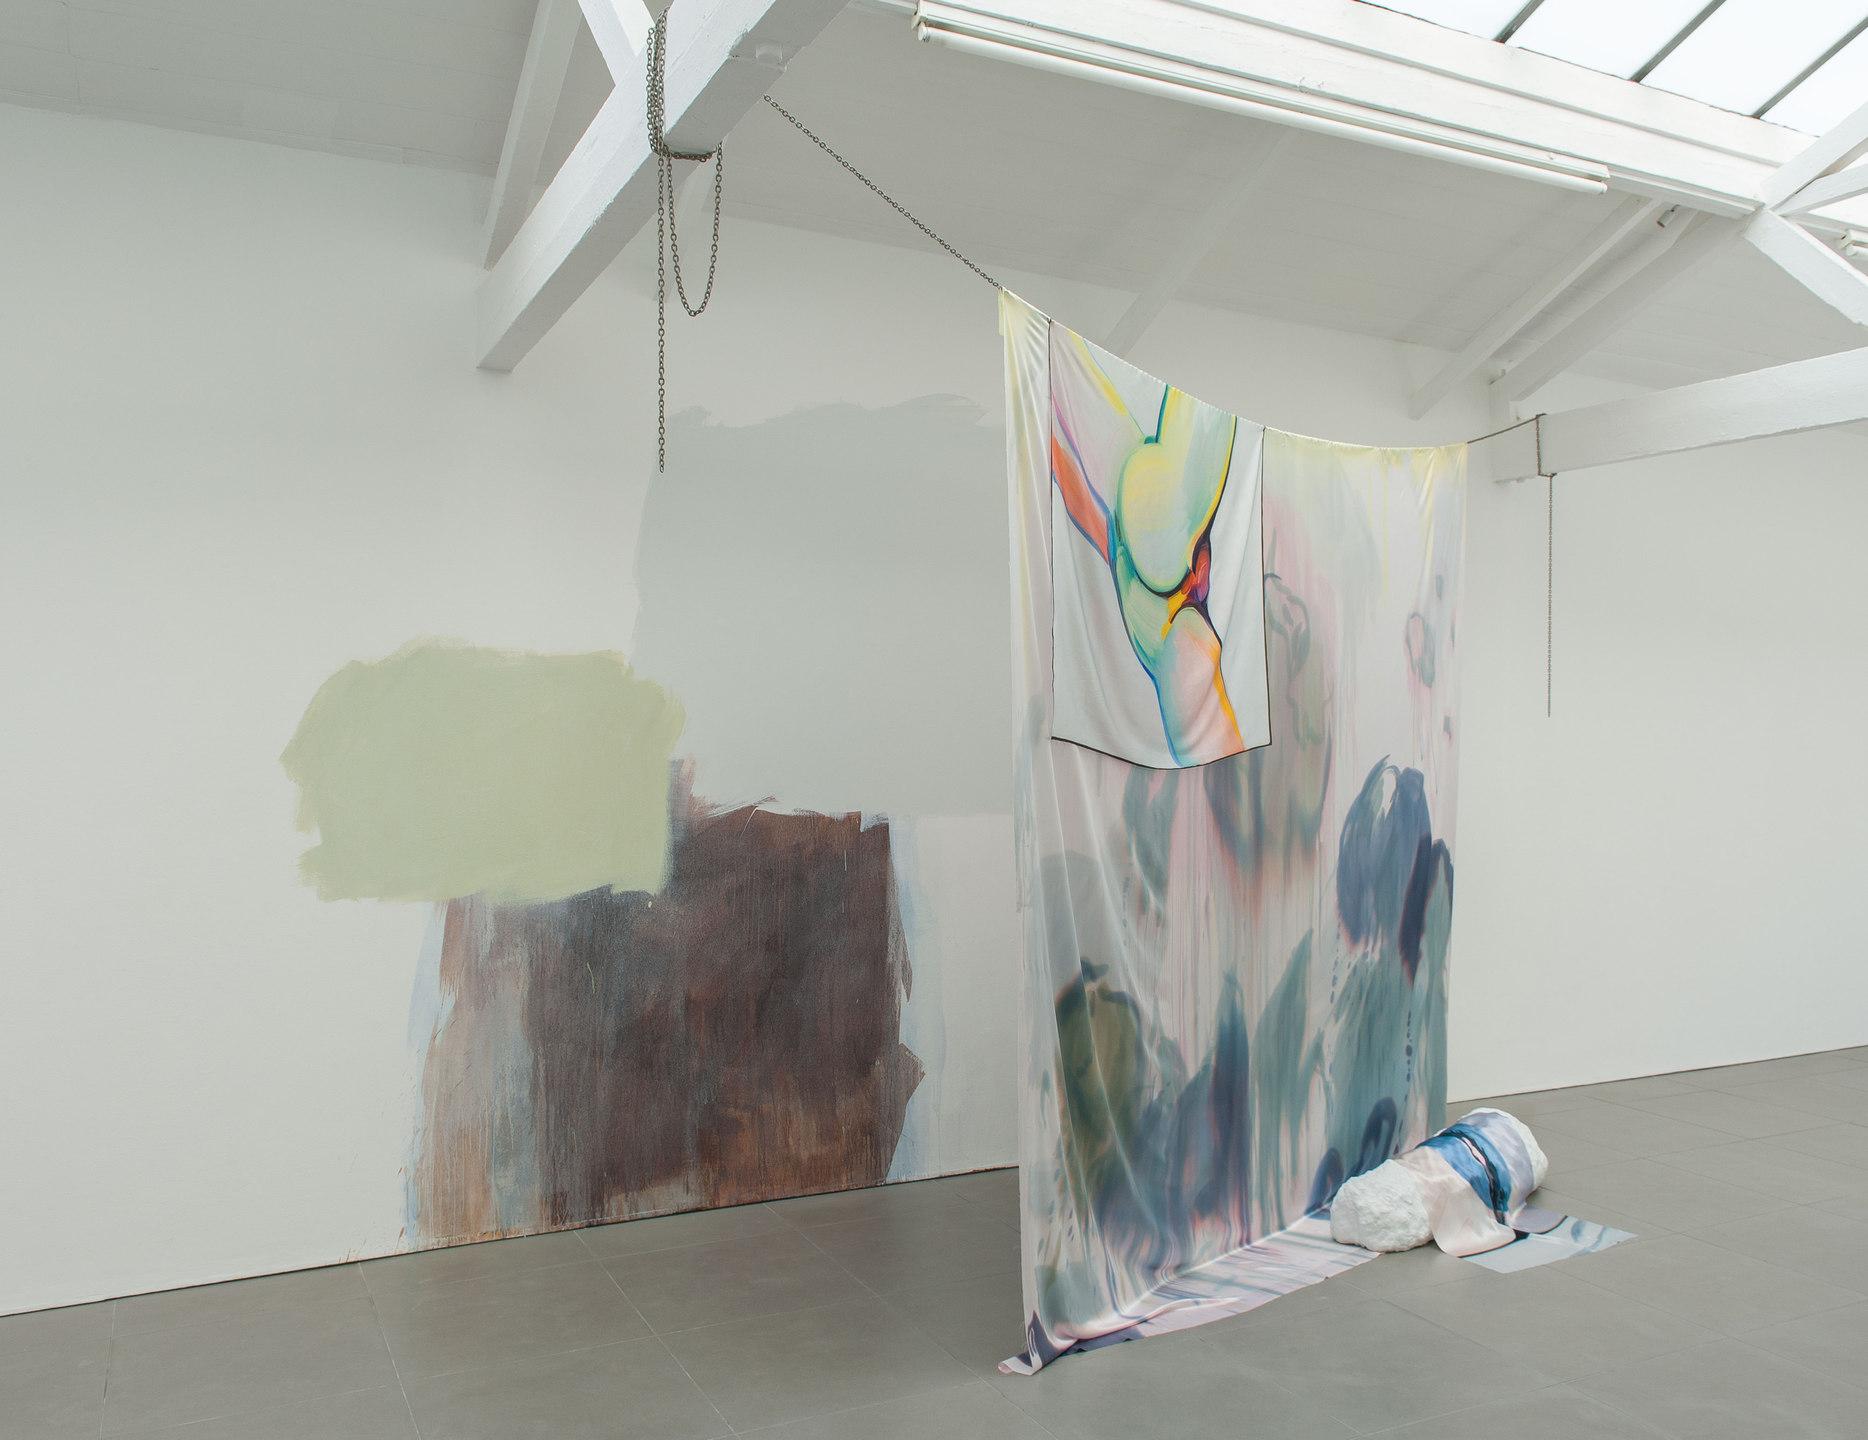 Roman Fountain, 2014, Celia Hempton, digital print on silk satin, 60 x 72 cm, silk paint on silk satin, 275 x 290 cm, acrylic paint on wall. Katie Cuddon, painted ceramic, 125 x 27 x 32 cm, Cell Project Space